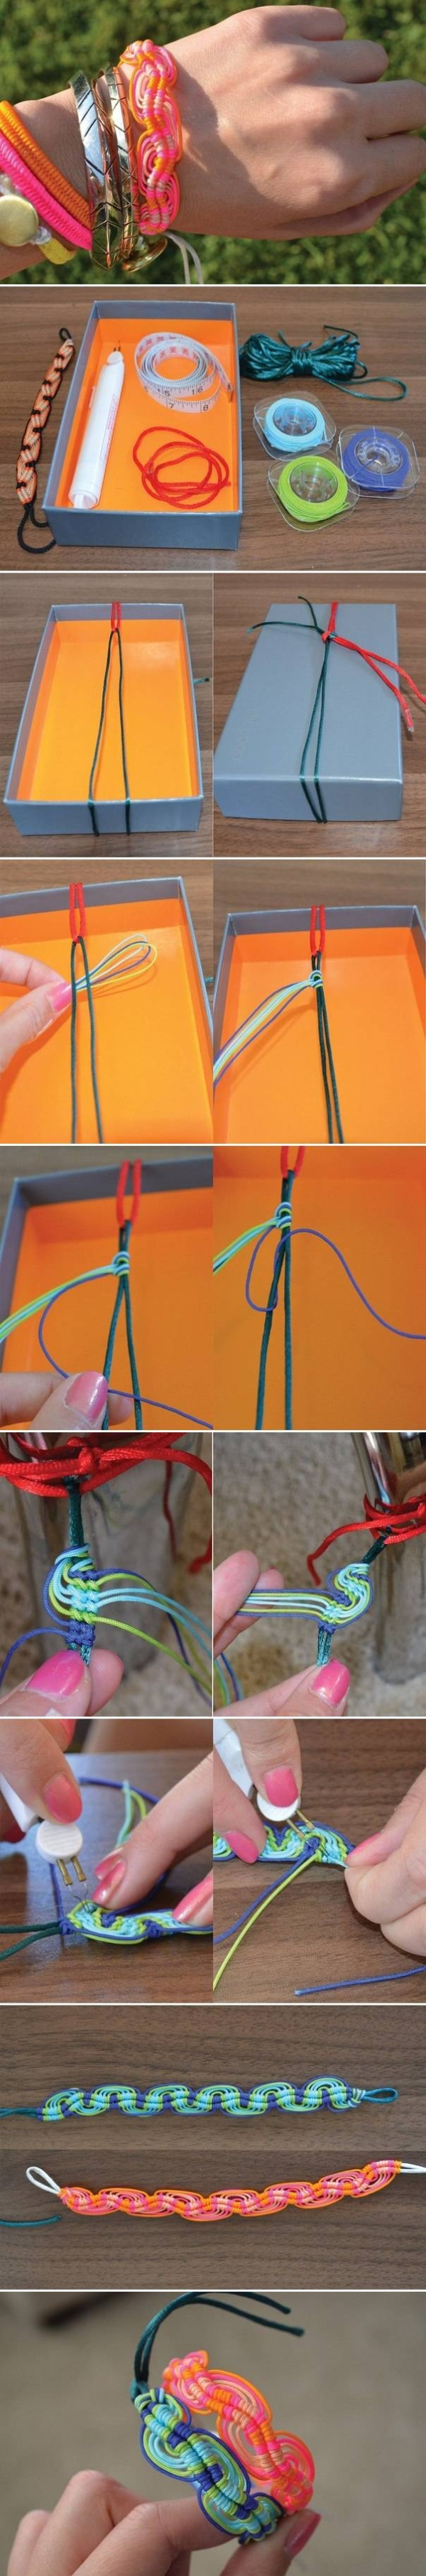 DIY Braided Bracelet DIY Braided Bracelet by diyforever. Wonderful!